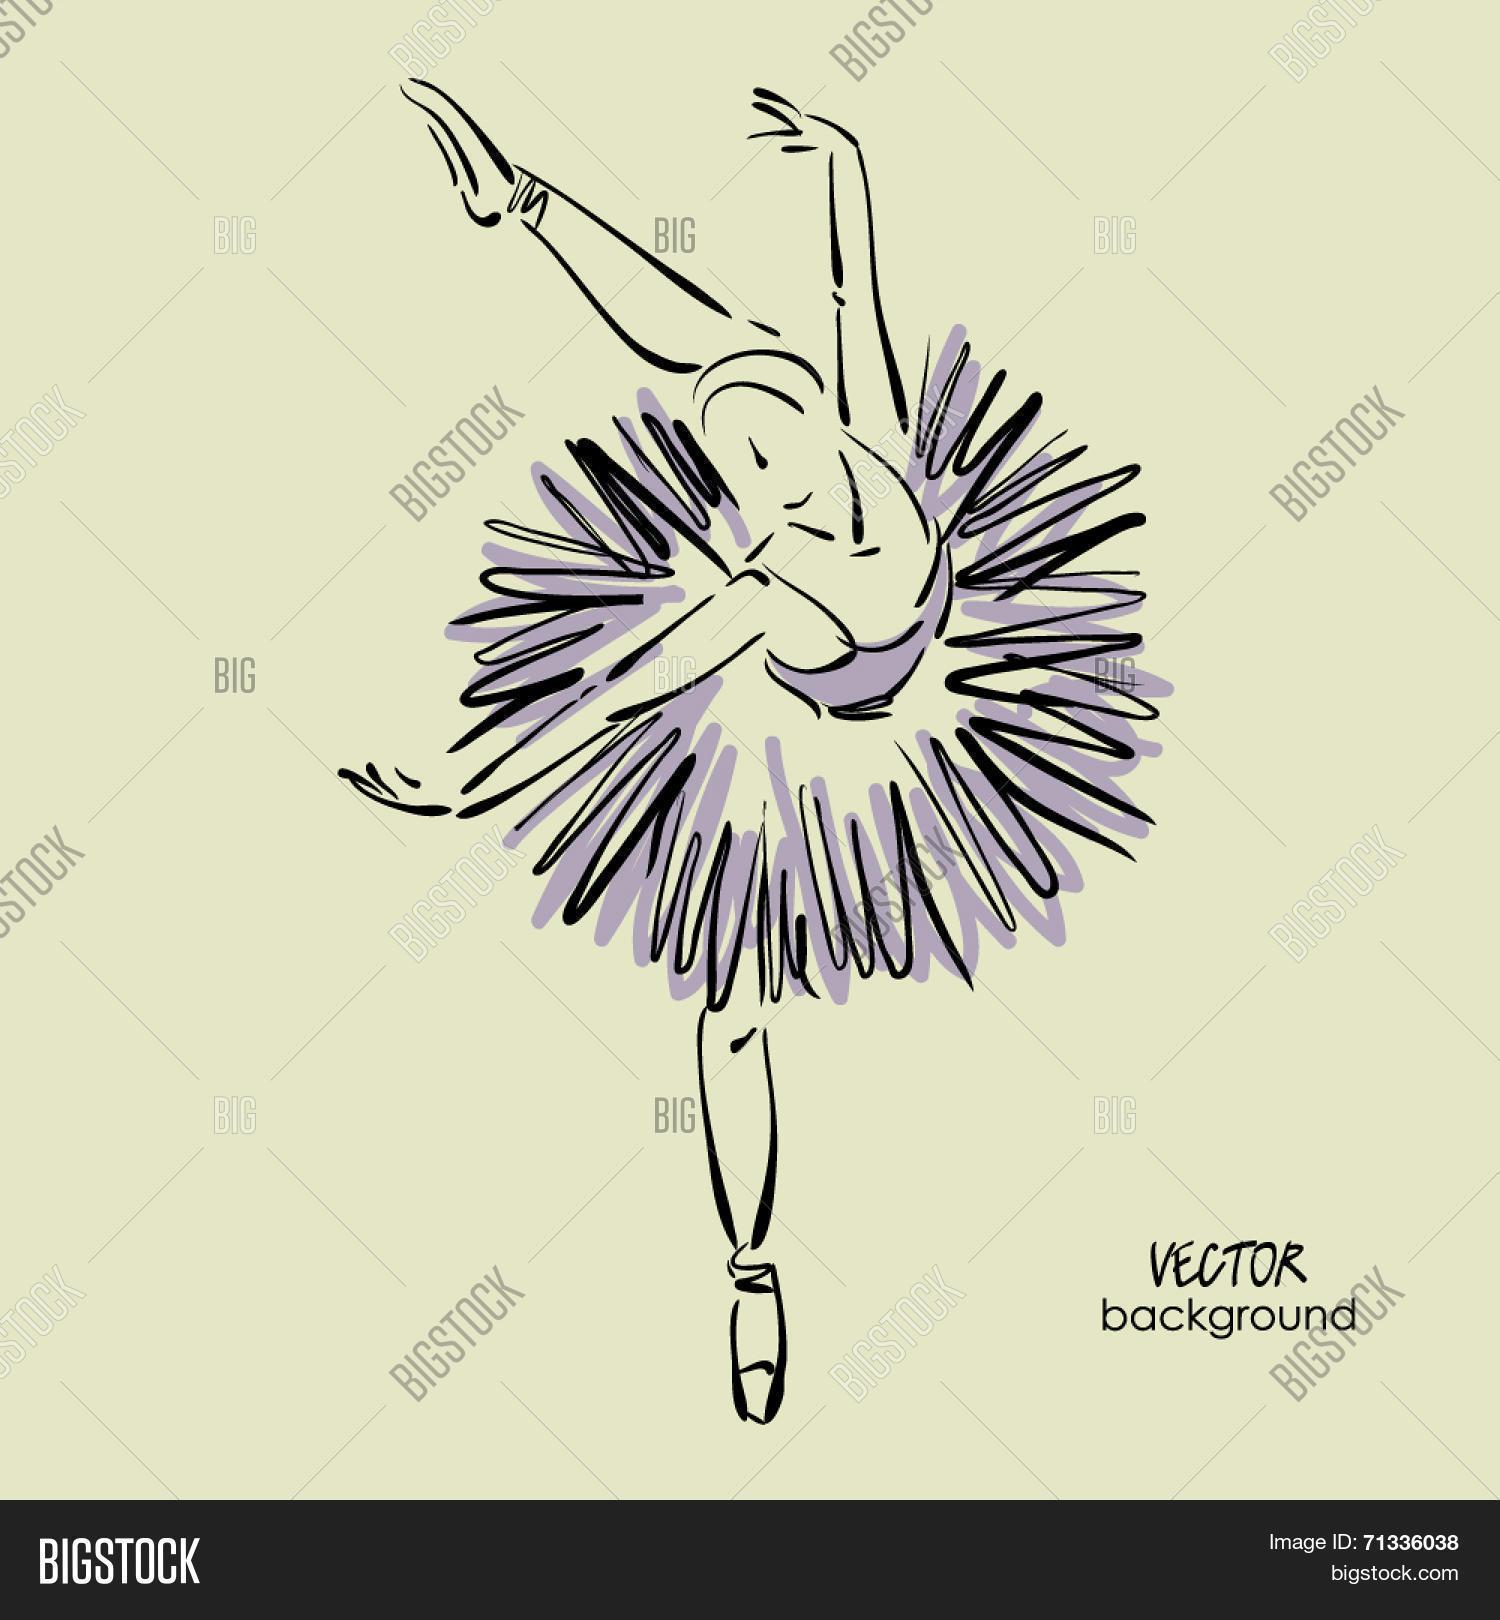 Art Sketch Beautiful Vector & Photo (Free Trial) | Bigstock